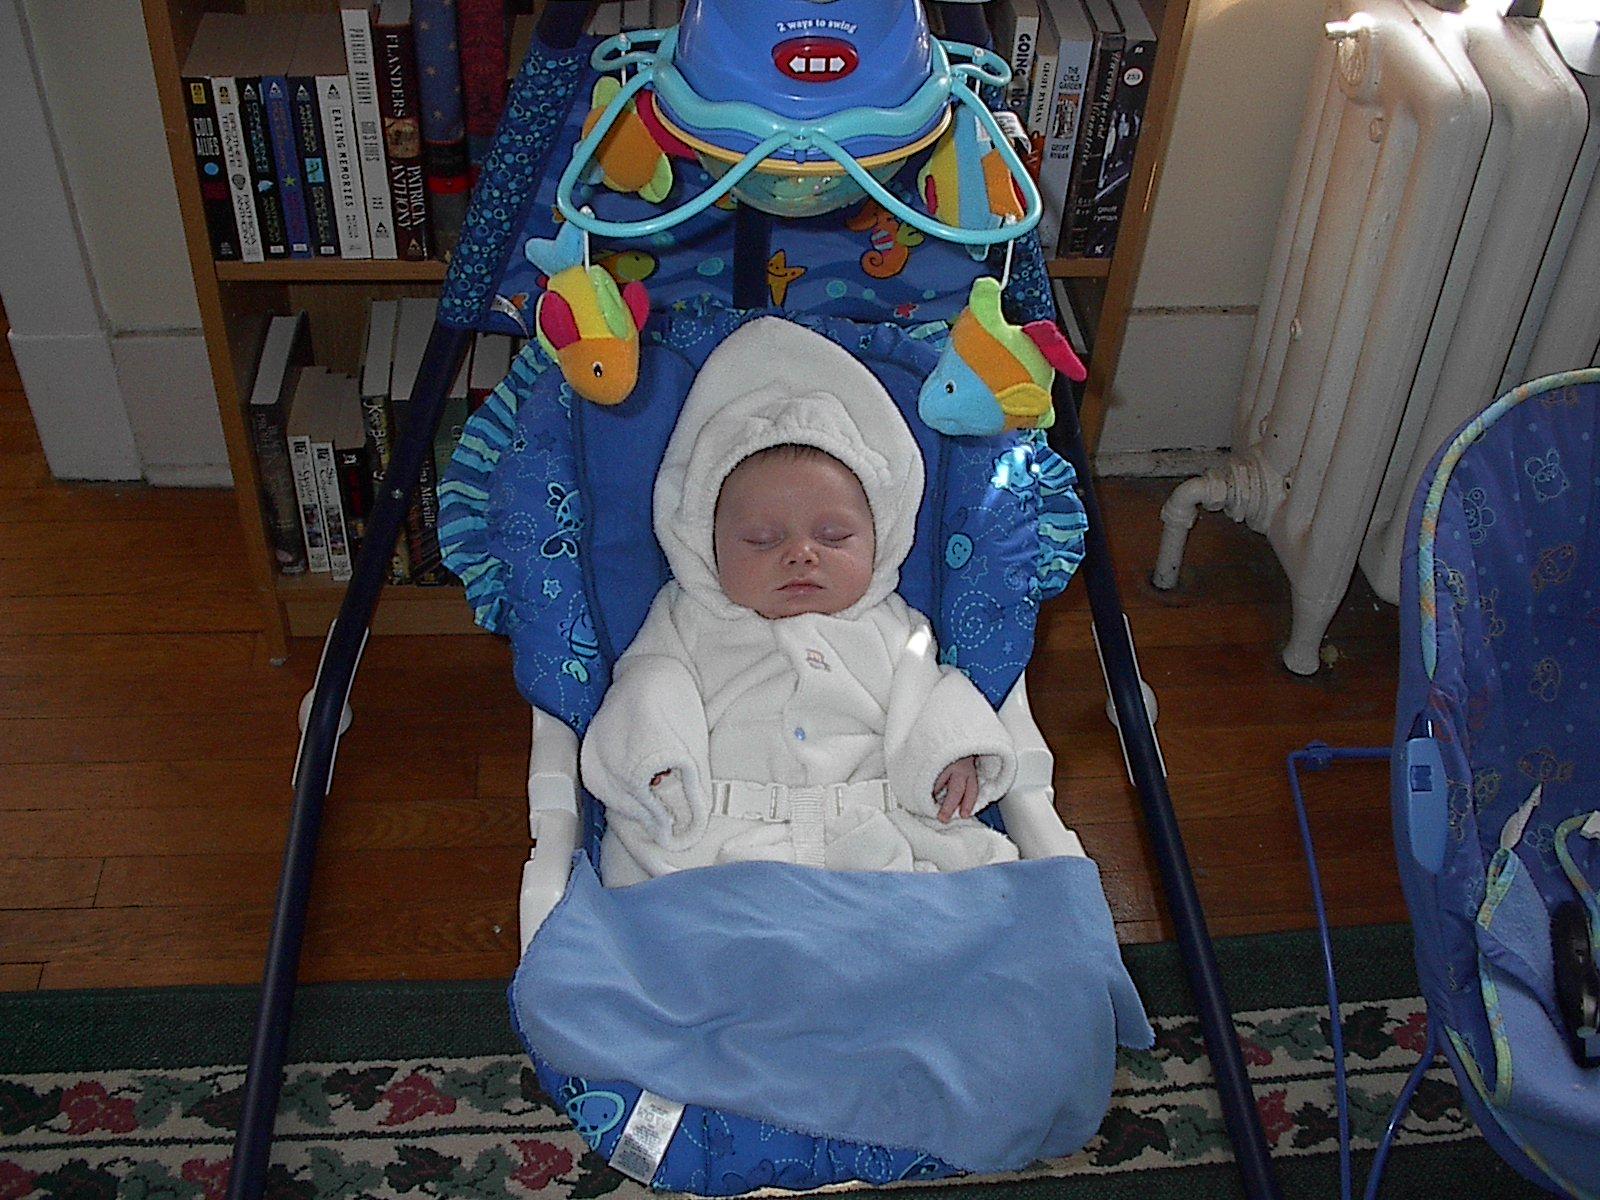 Pope baby